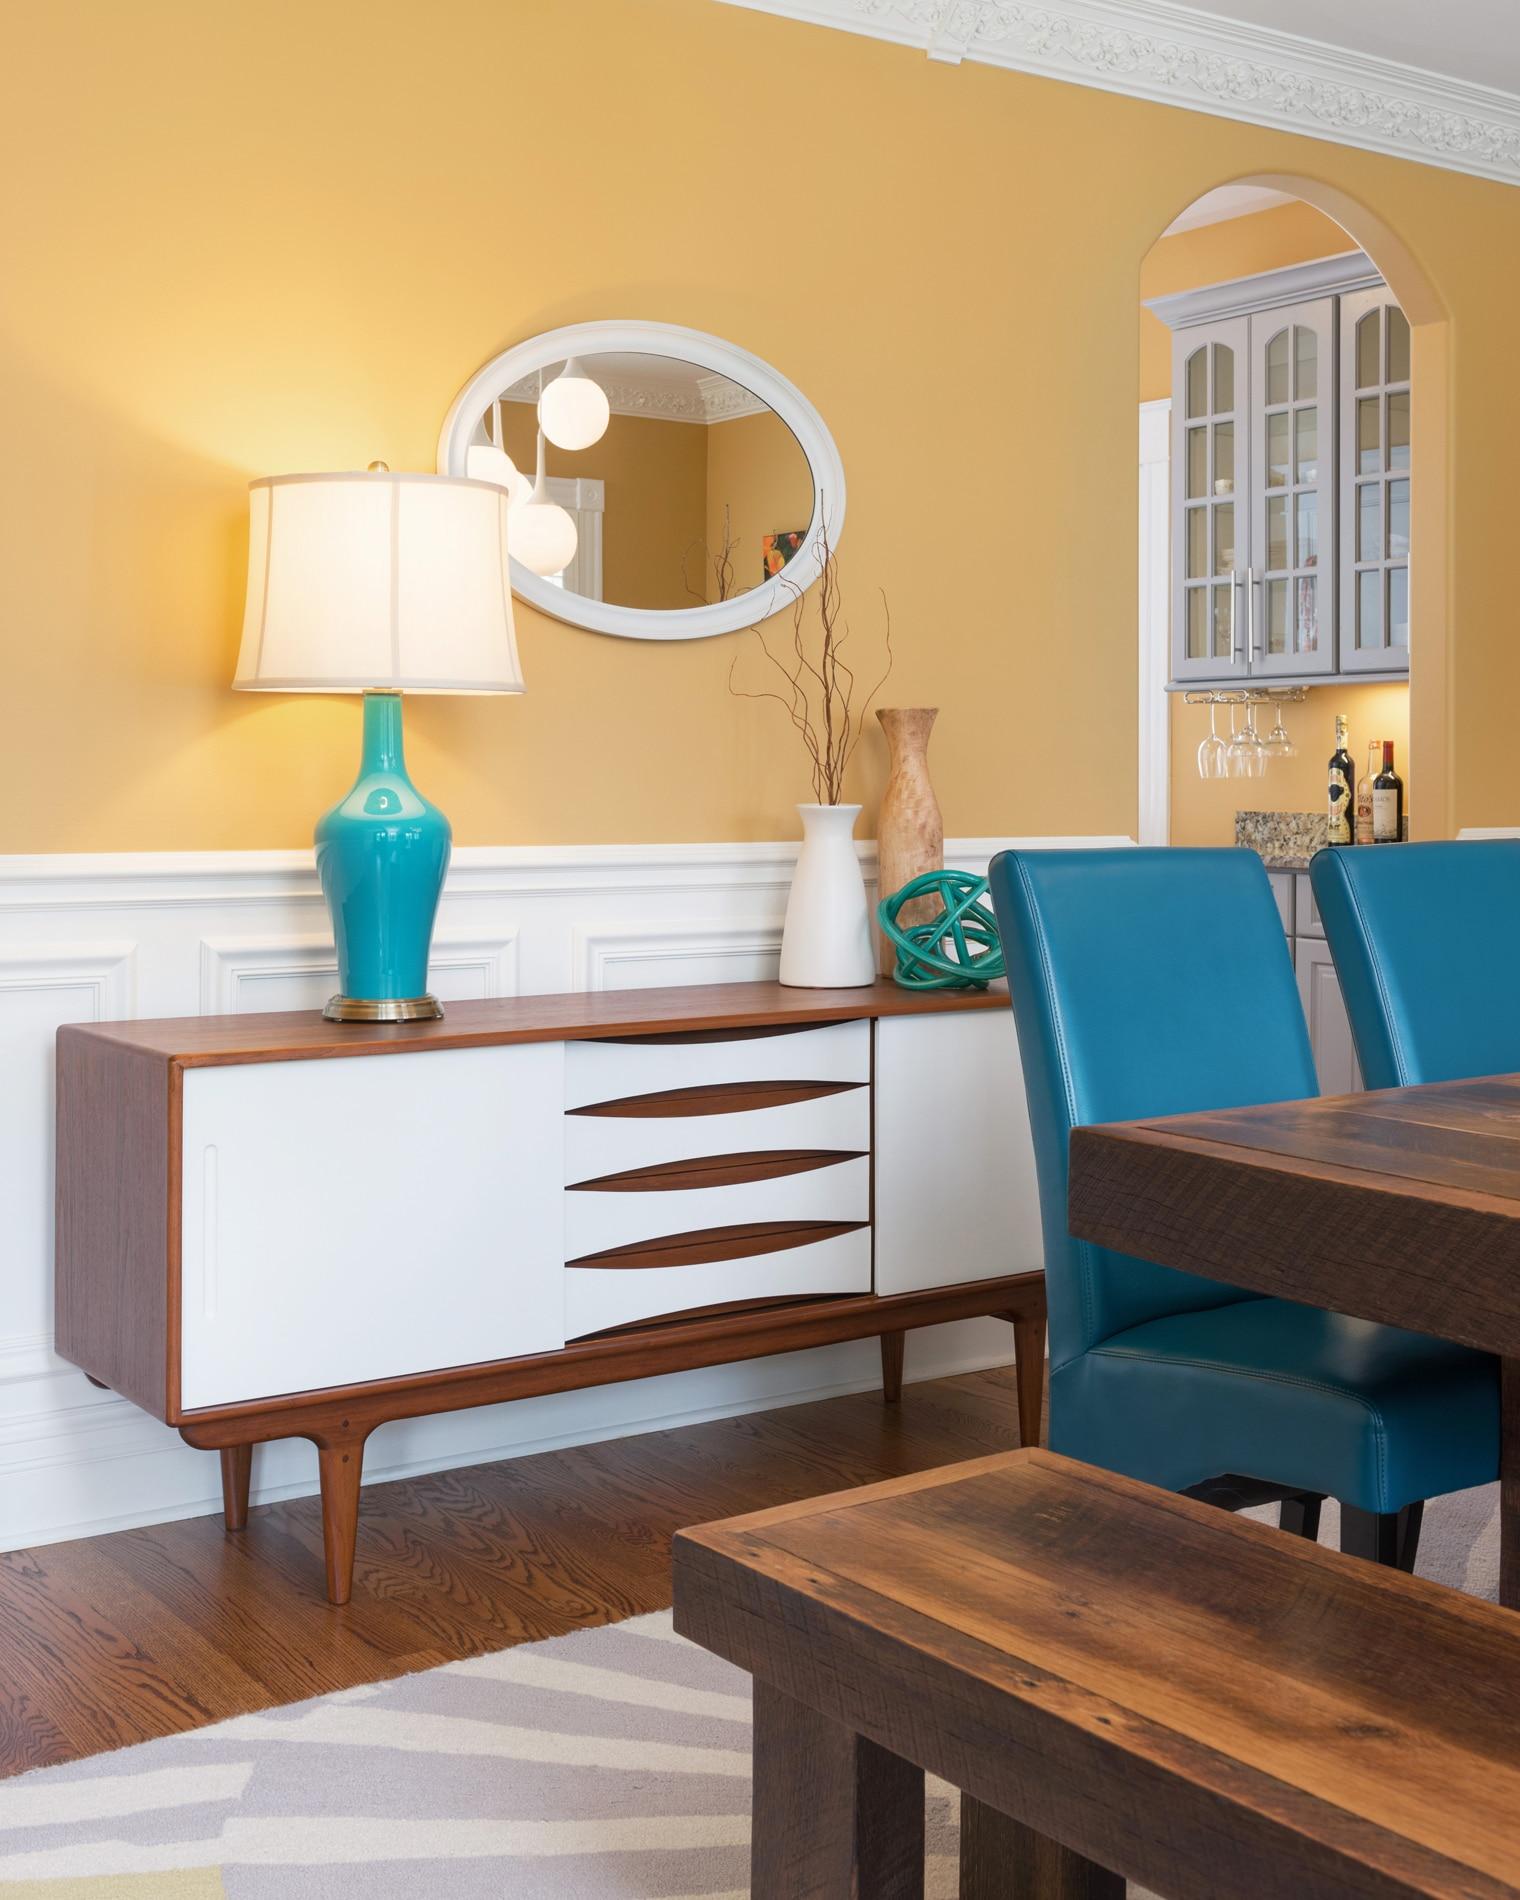 Mid Century Modern Furniture Design: Ladue News: Midcentury Modern